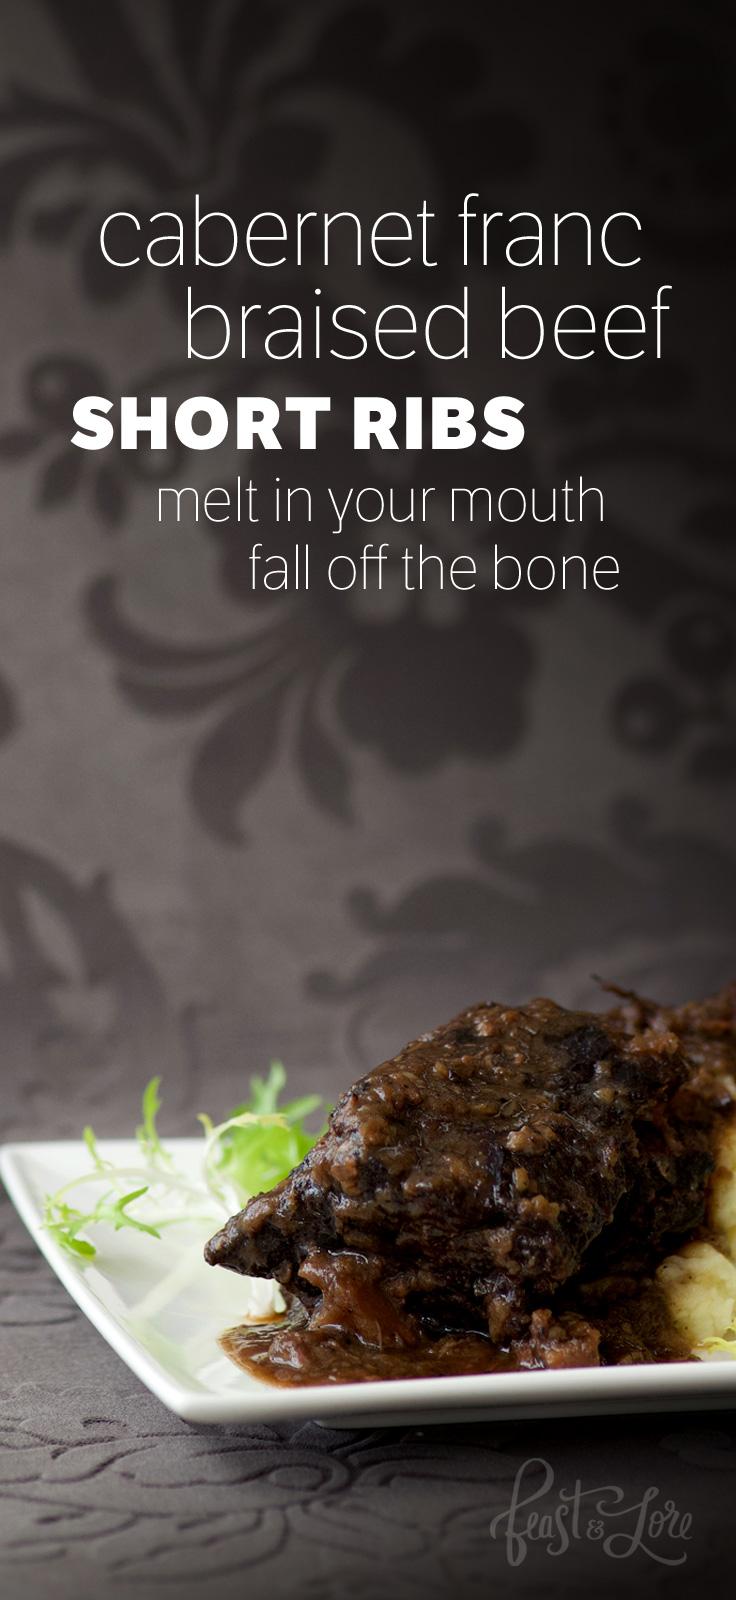 Cabernet Franc braised beef short ribs